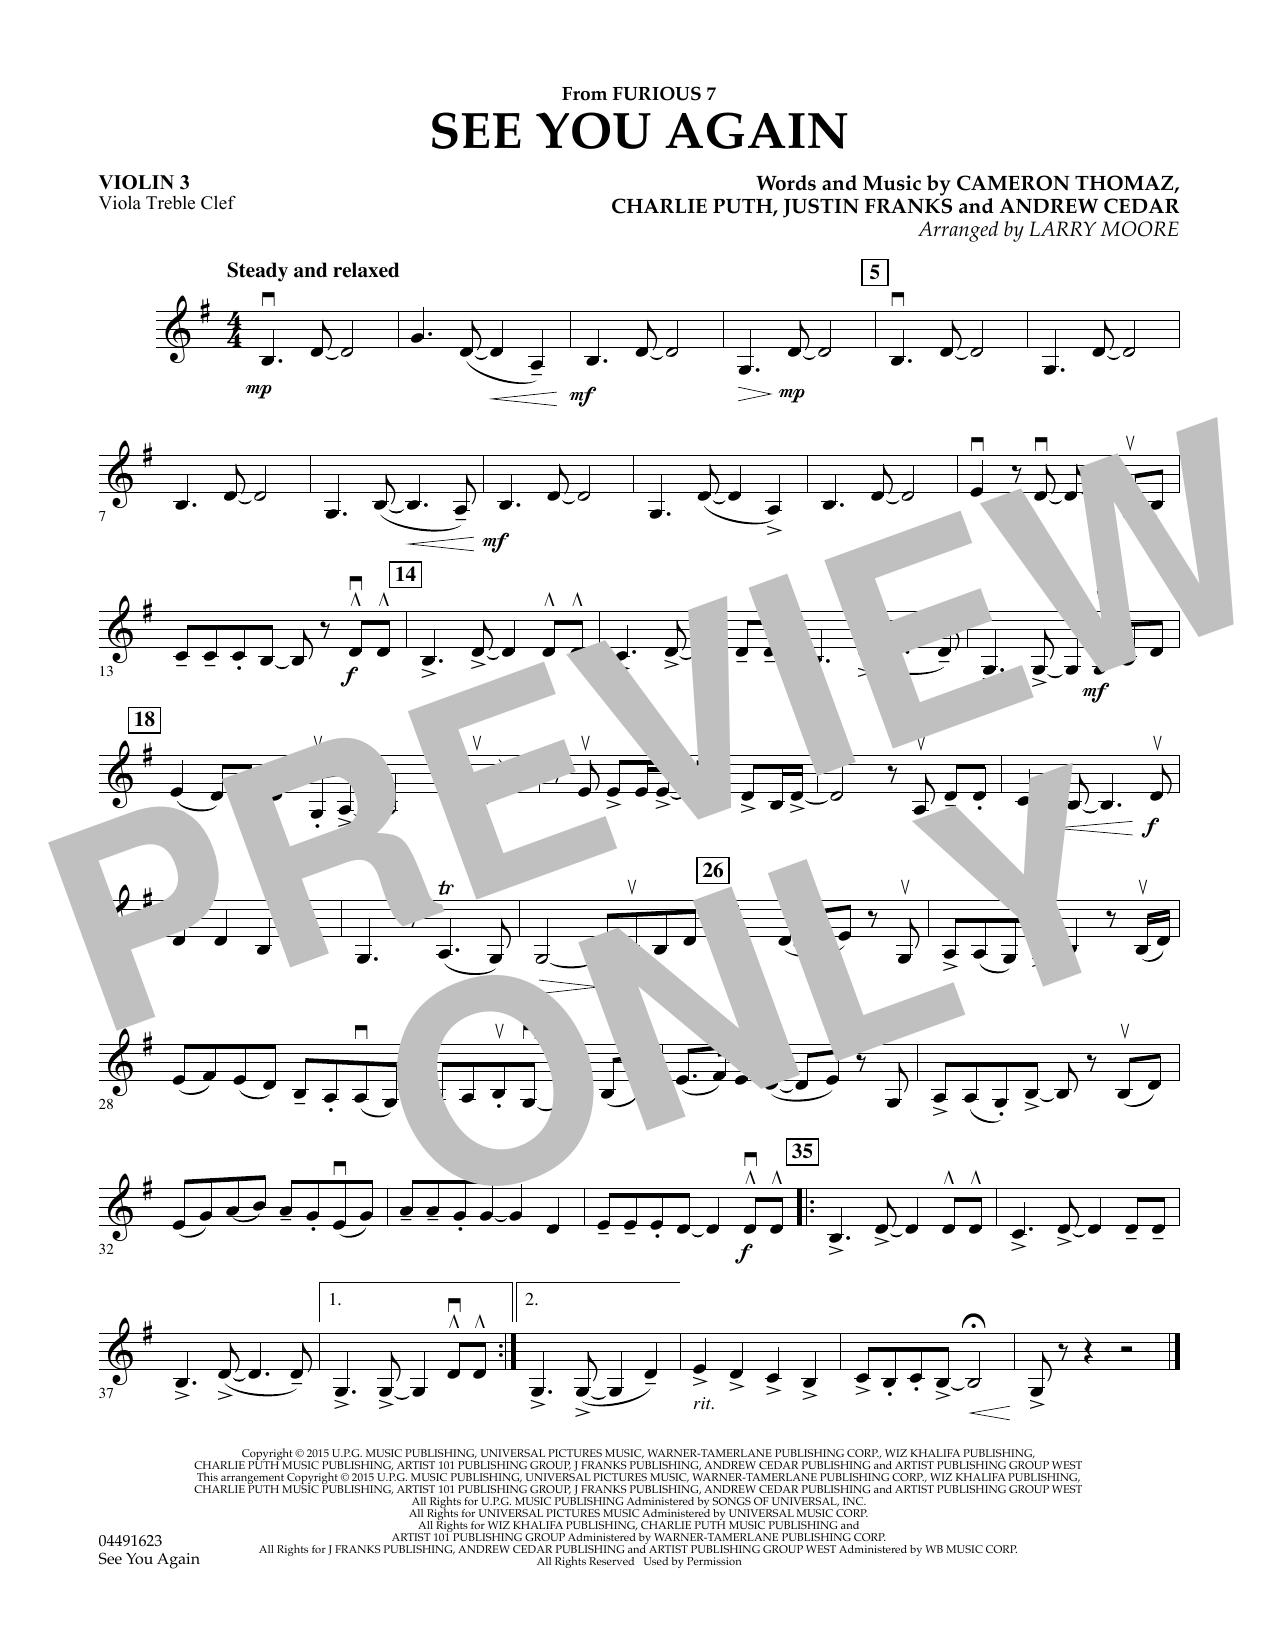 See You Again - Violin 3 (Viola Treble Clef) (Orchestra)